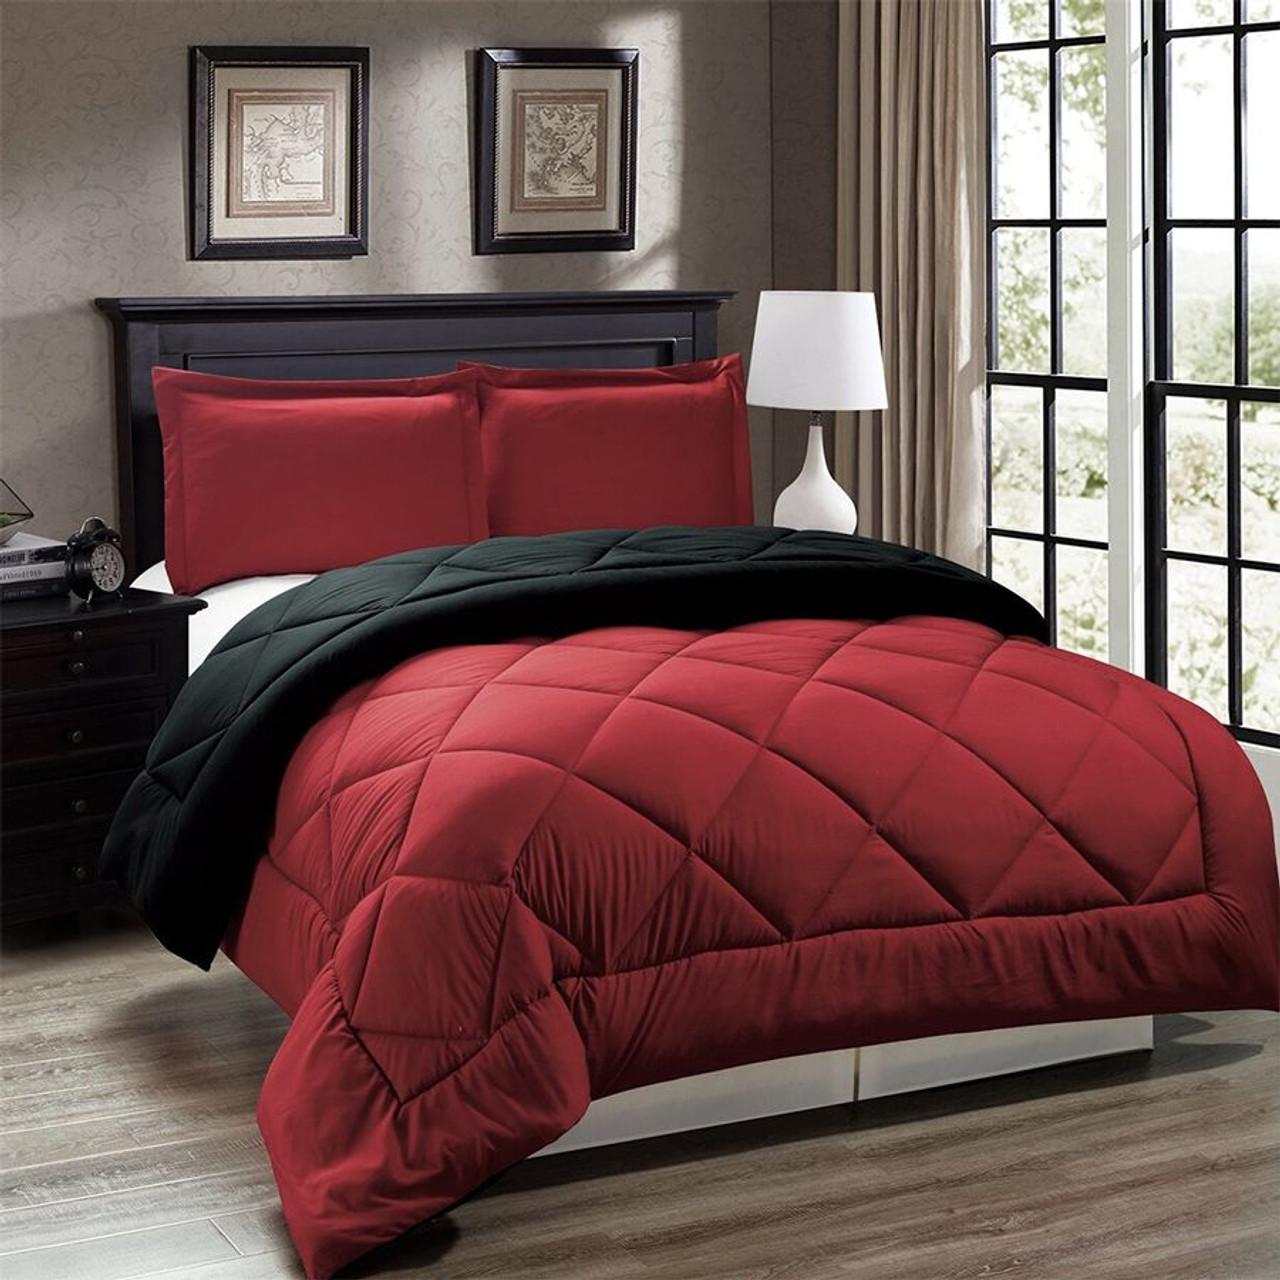 3pc Down Alternative Reversible Comforter Set in Red